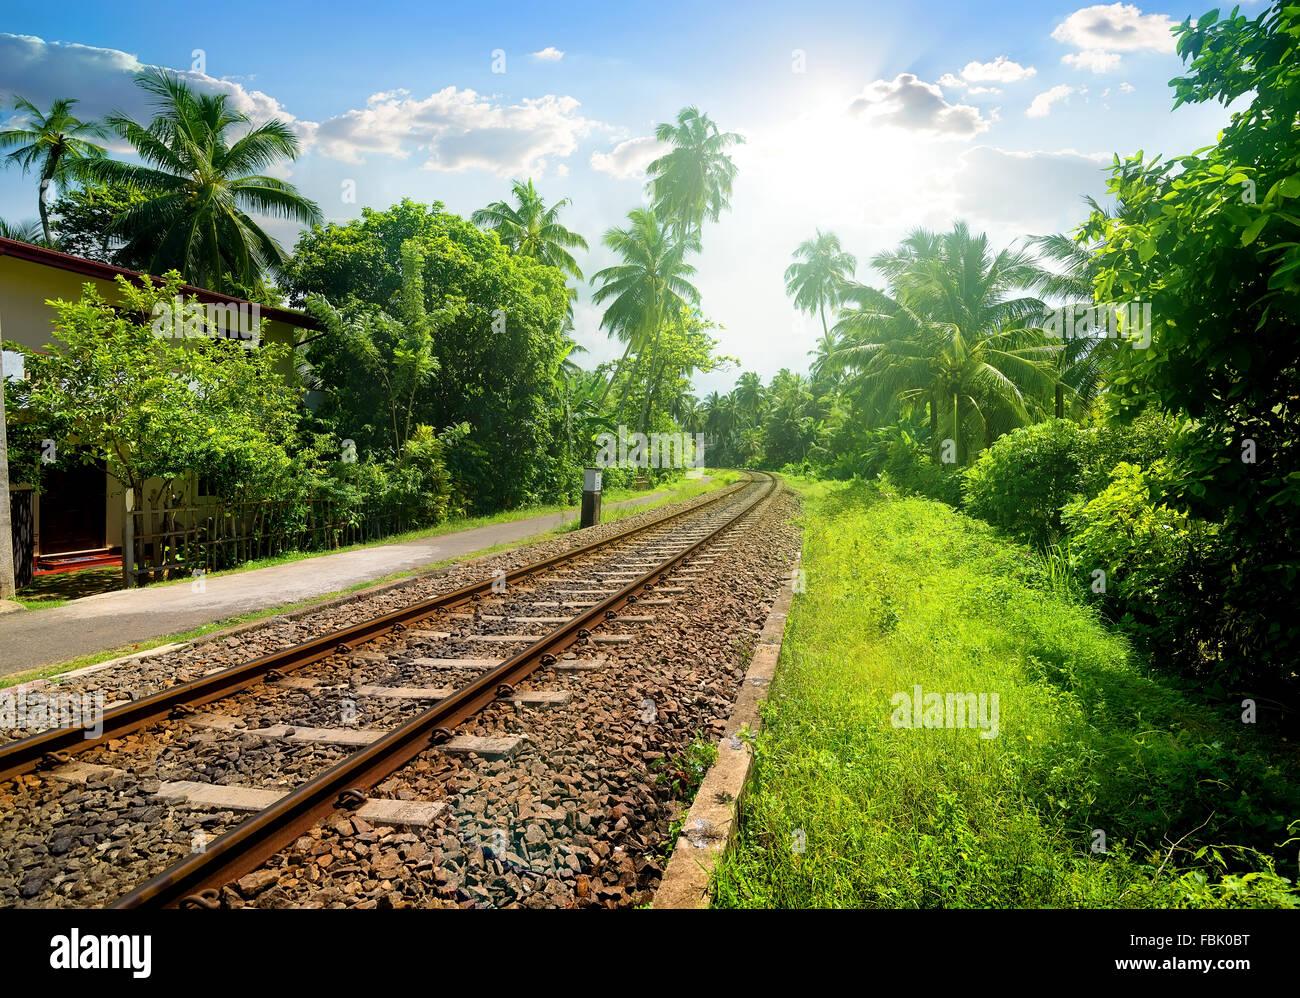 Eisenbahn durch grünen Palmenwald in Sri Lanka Stockbild